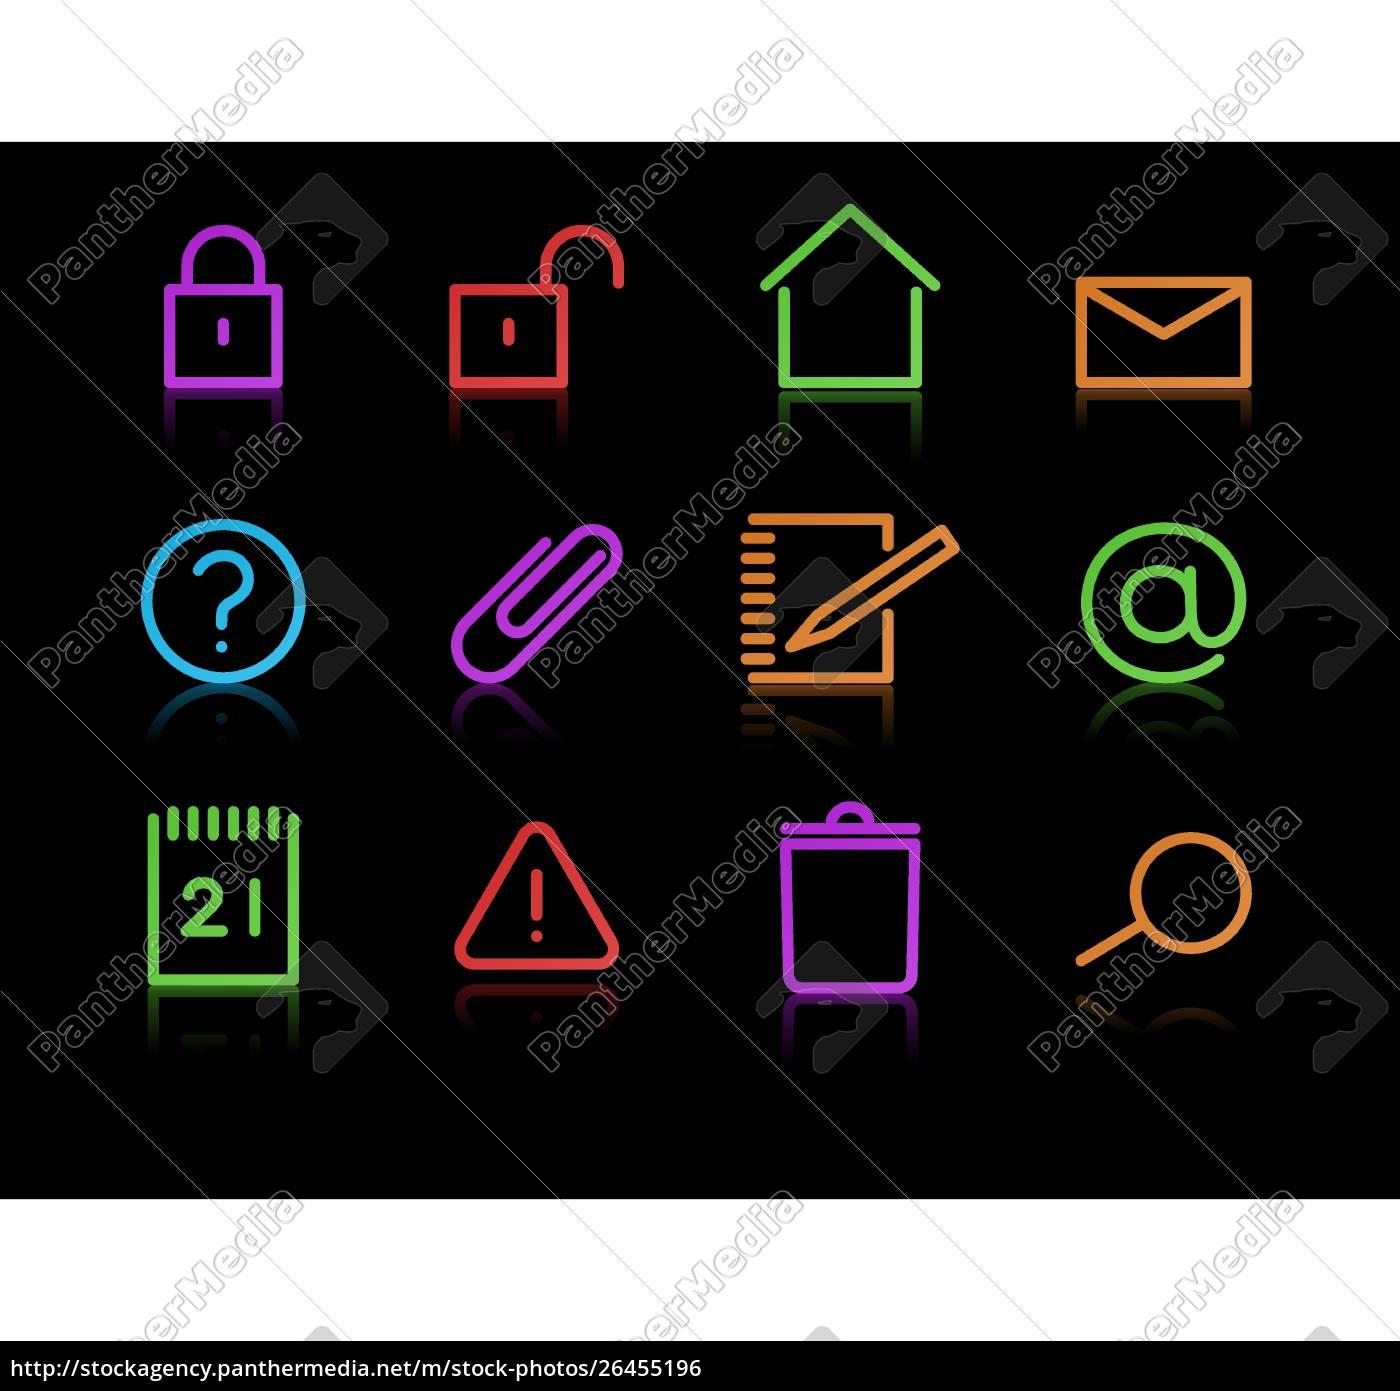 vector, set, of, elegant, neon, simple - 26455196